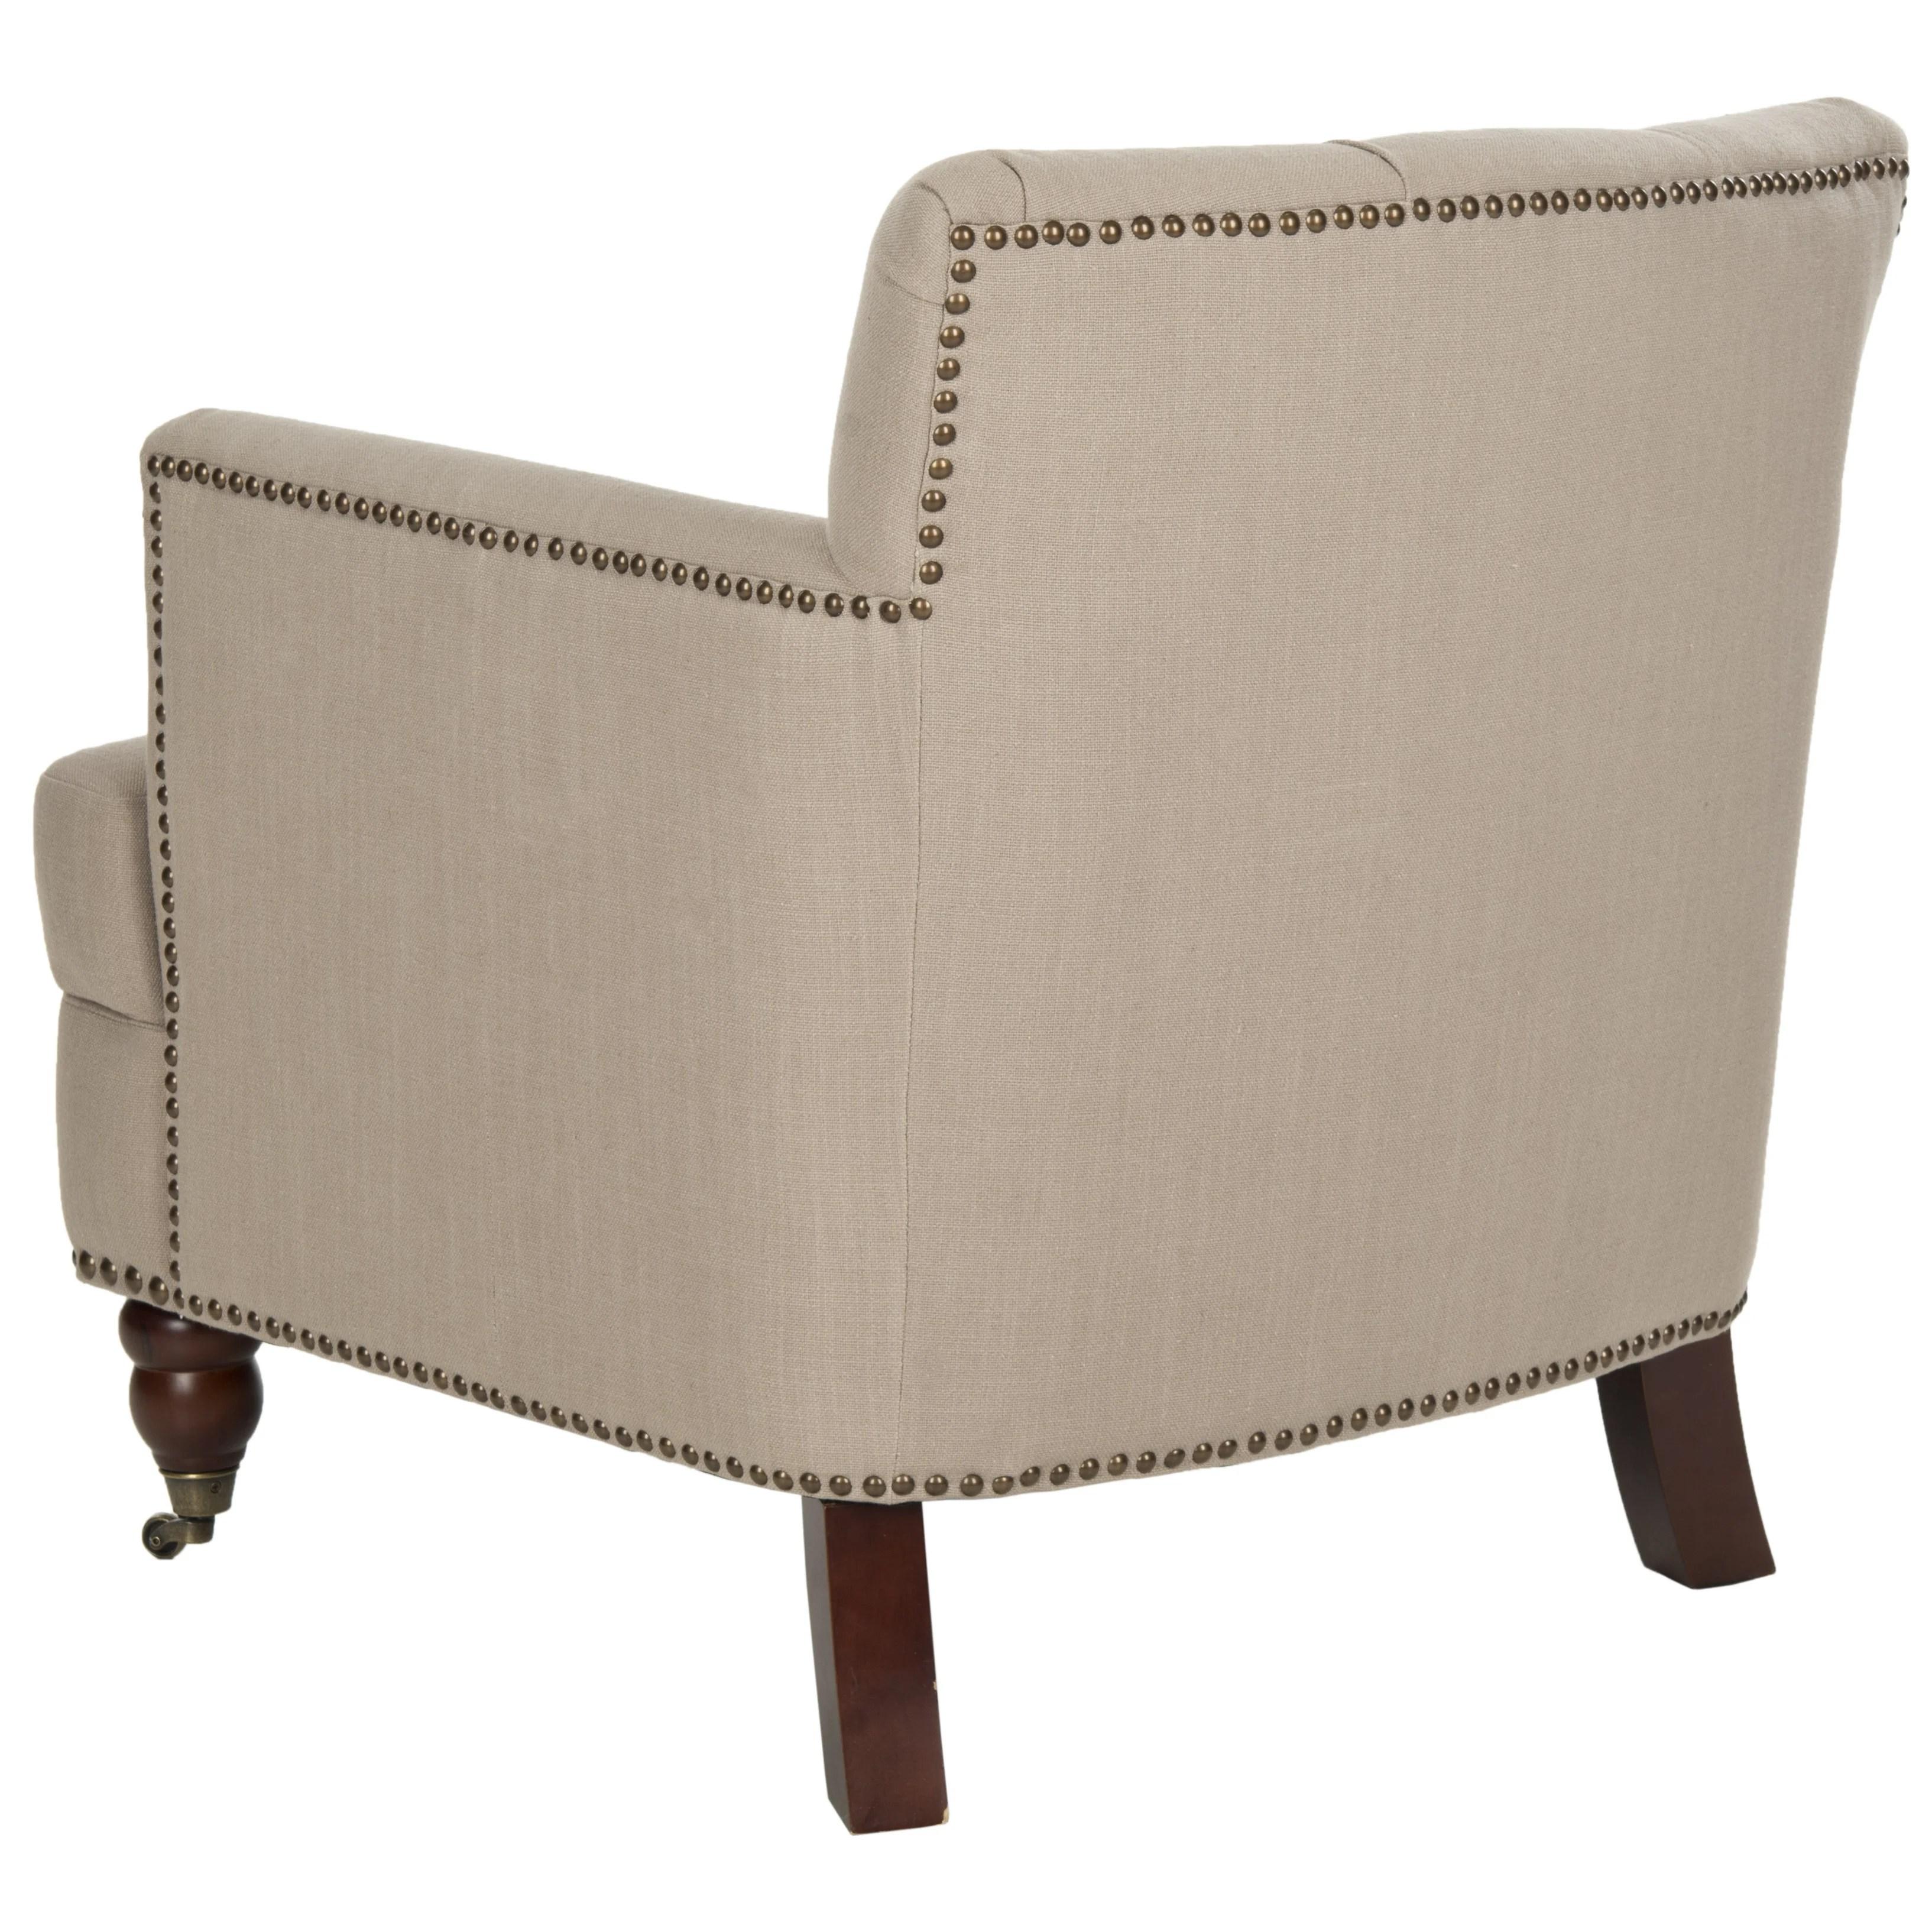 safavieh colin tufted club chair ebay salon chairs darby home co alderbrook wayfair